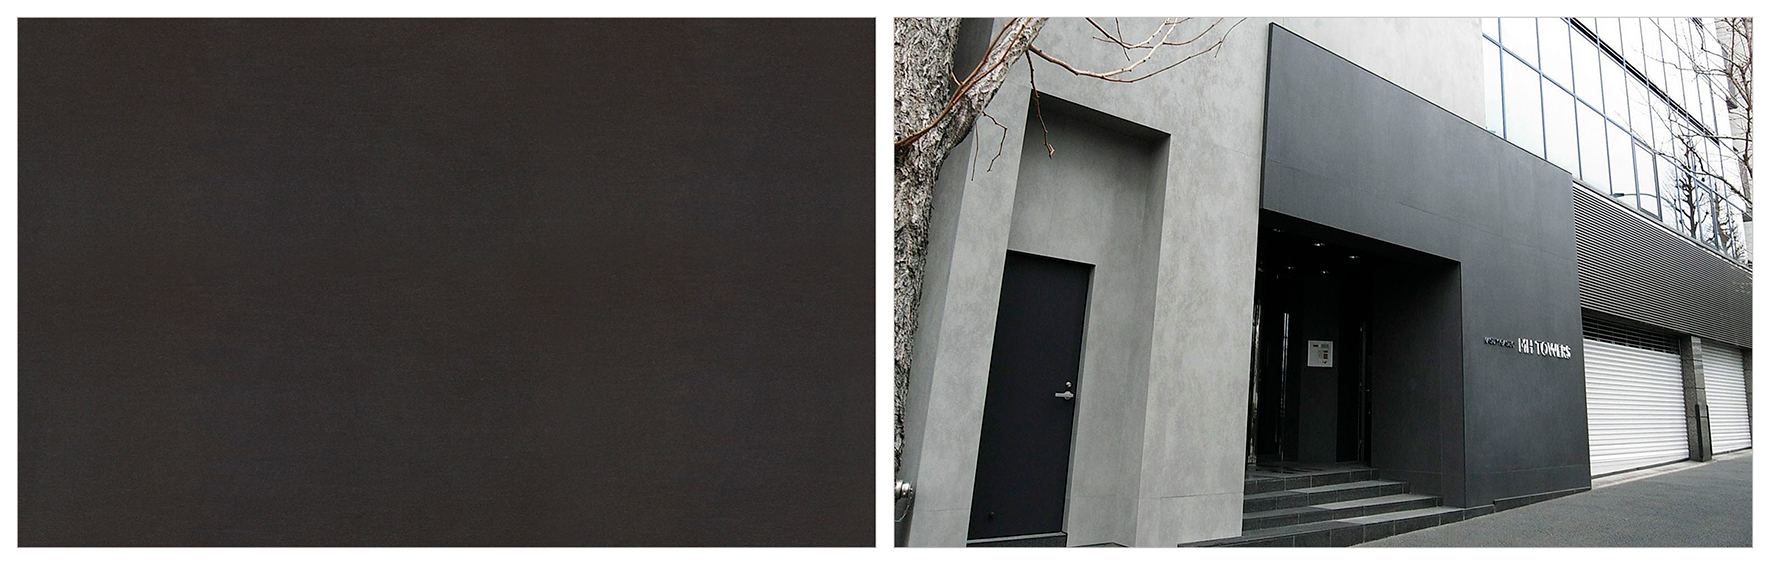 Basalto-Vena-Scura-1000x3000x3mm